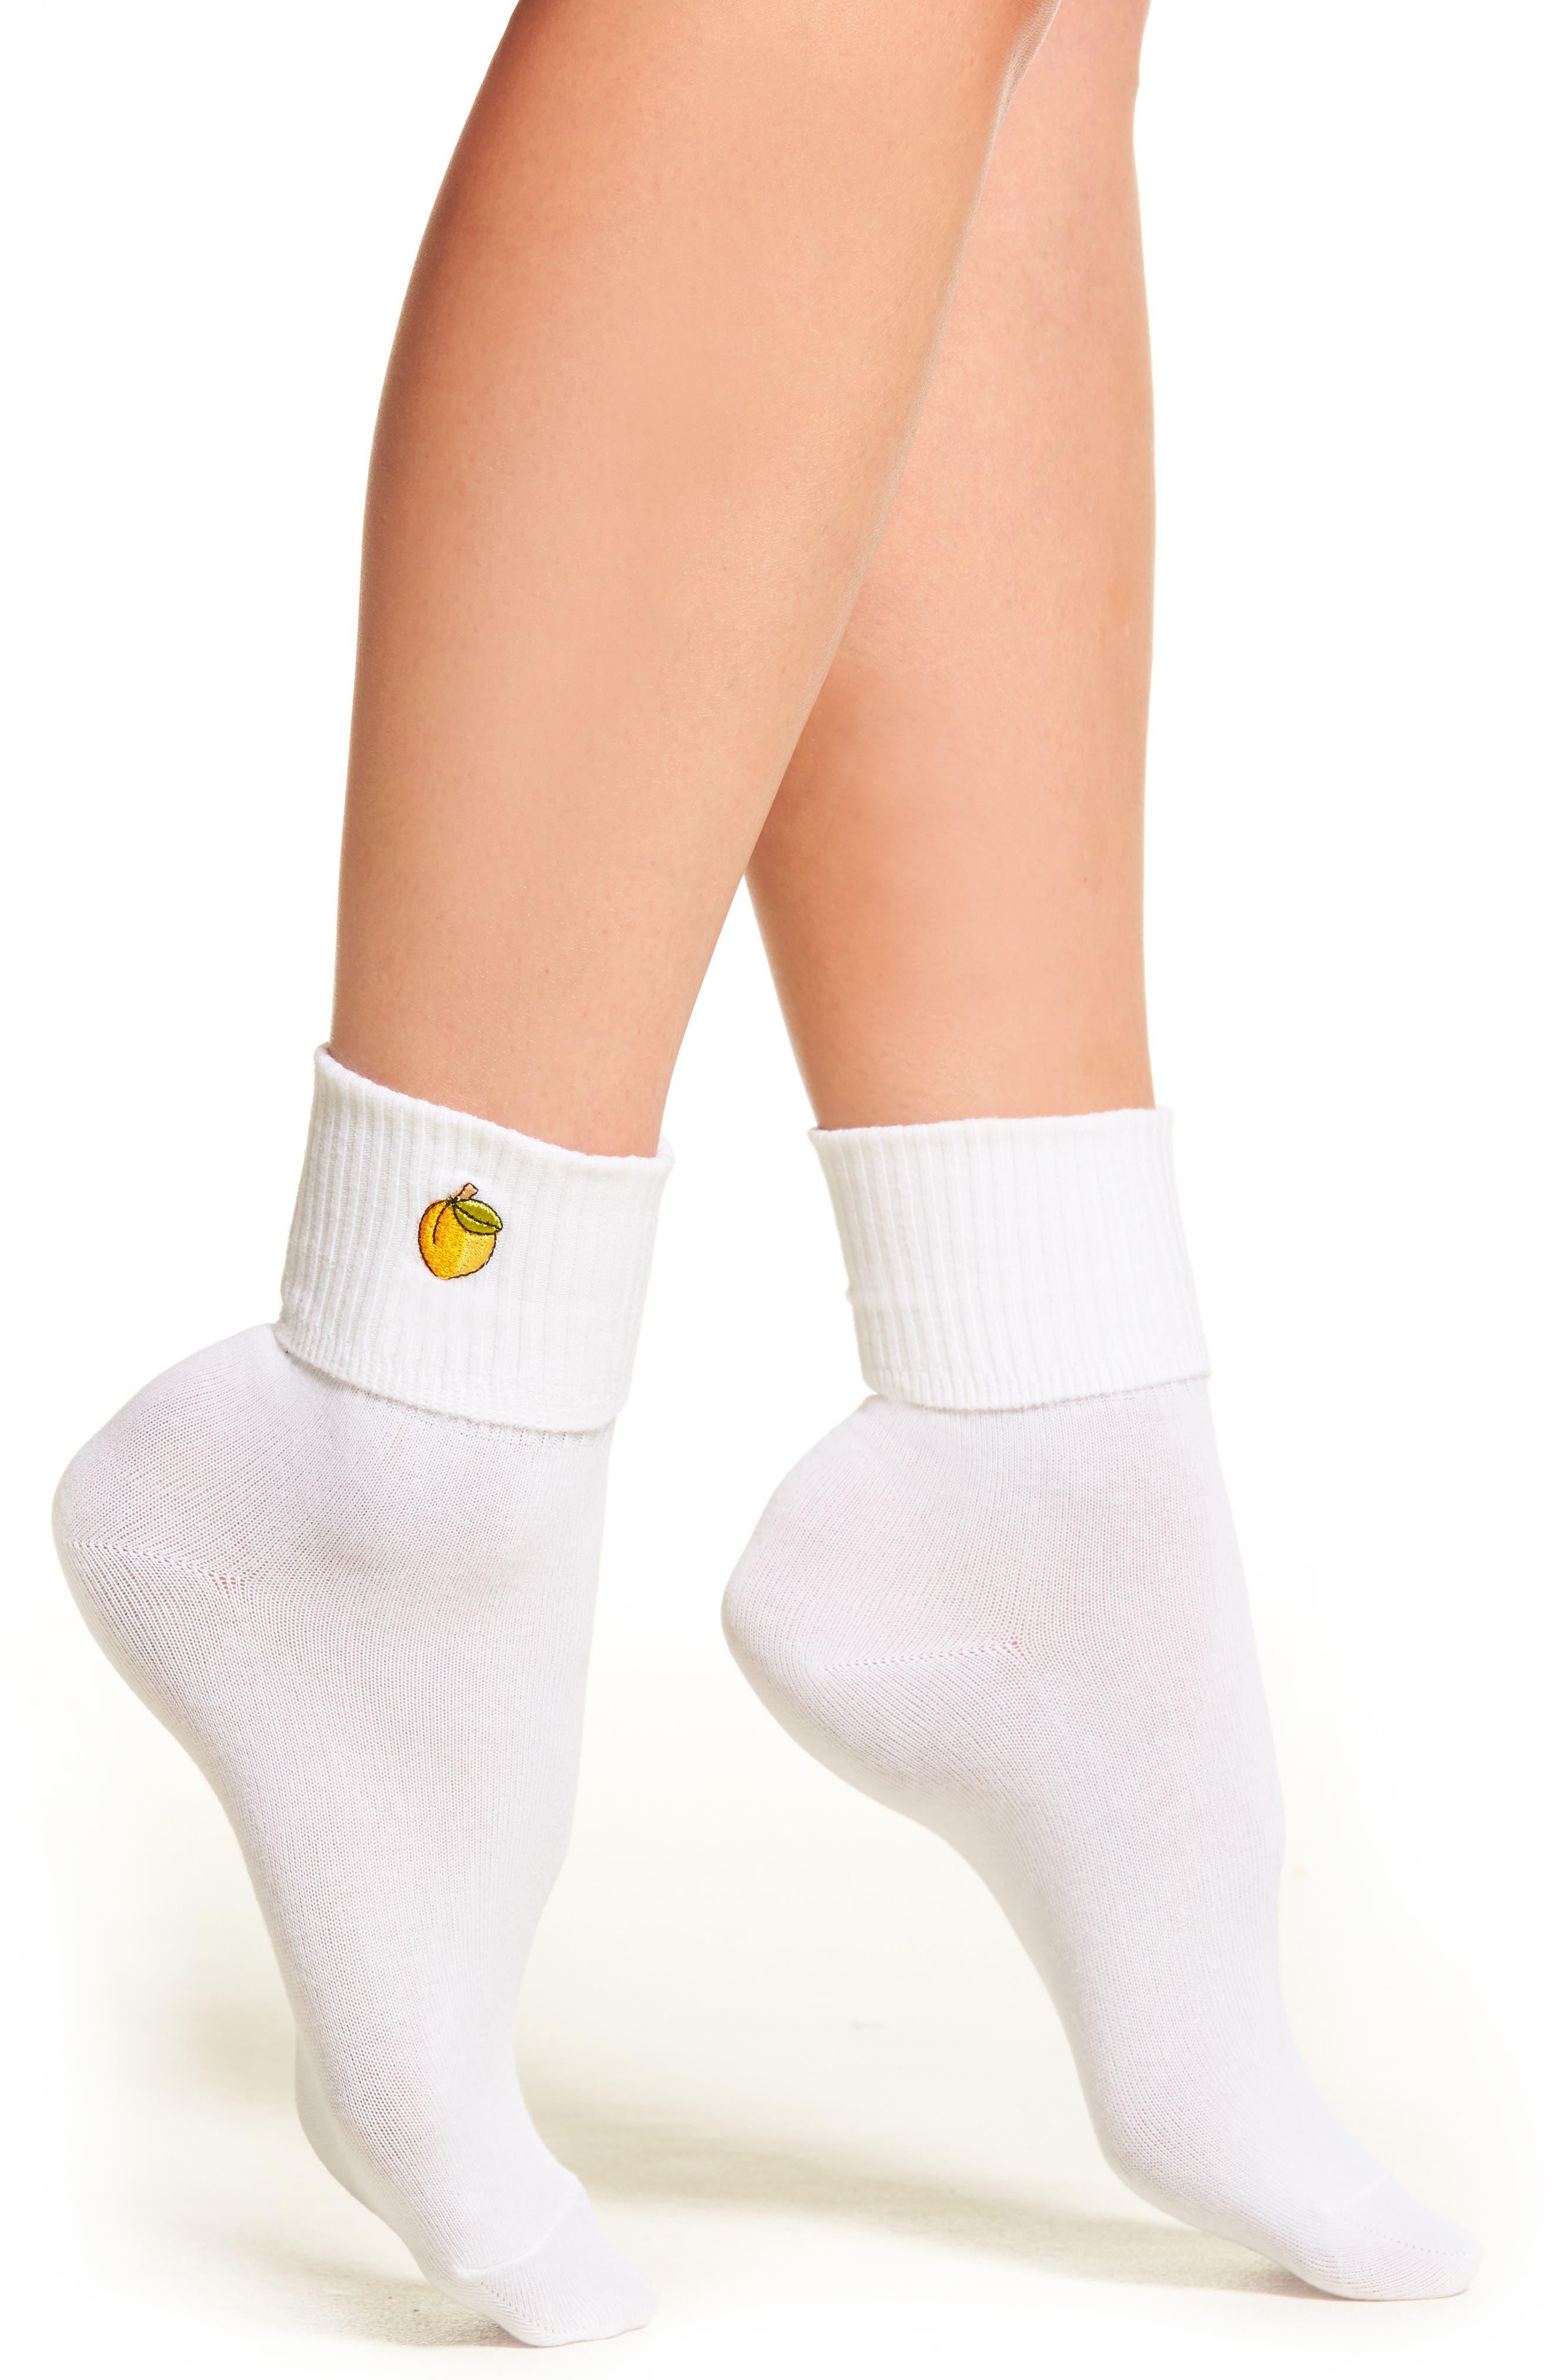 Alternate Image 1 Selected - Yeah Bunny Peach Socks